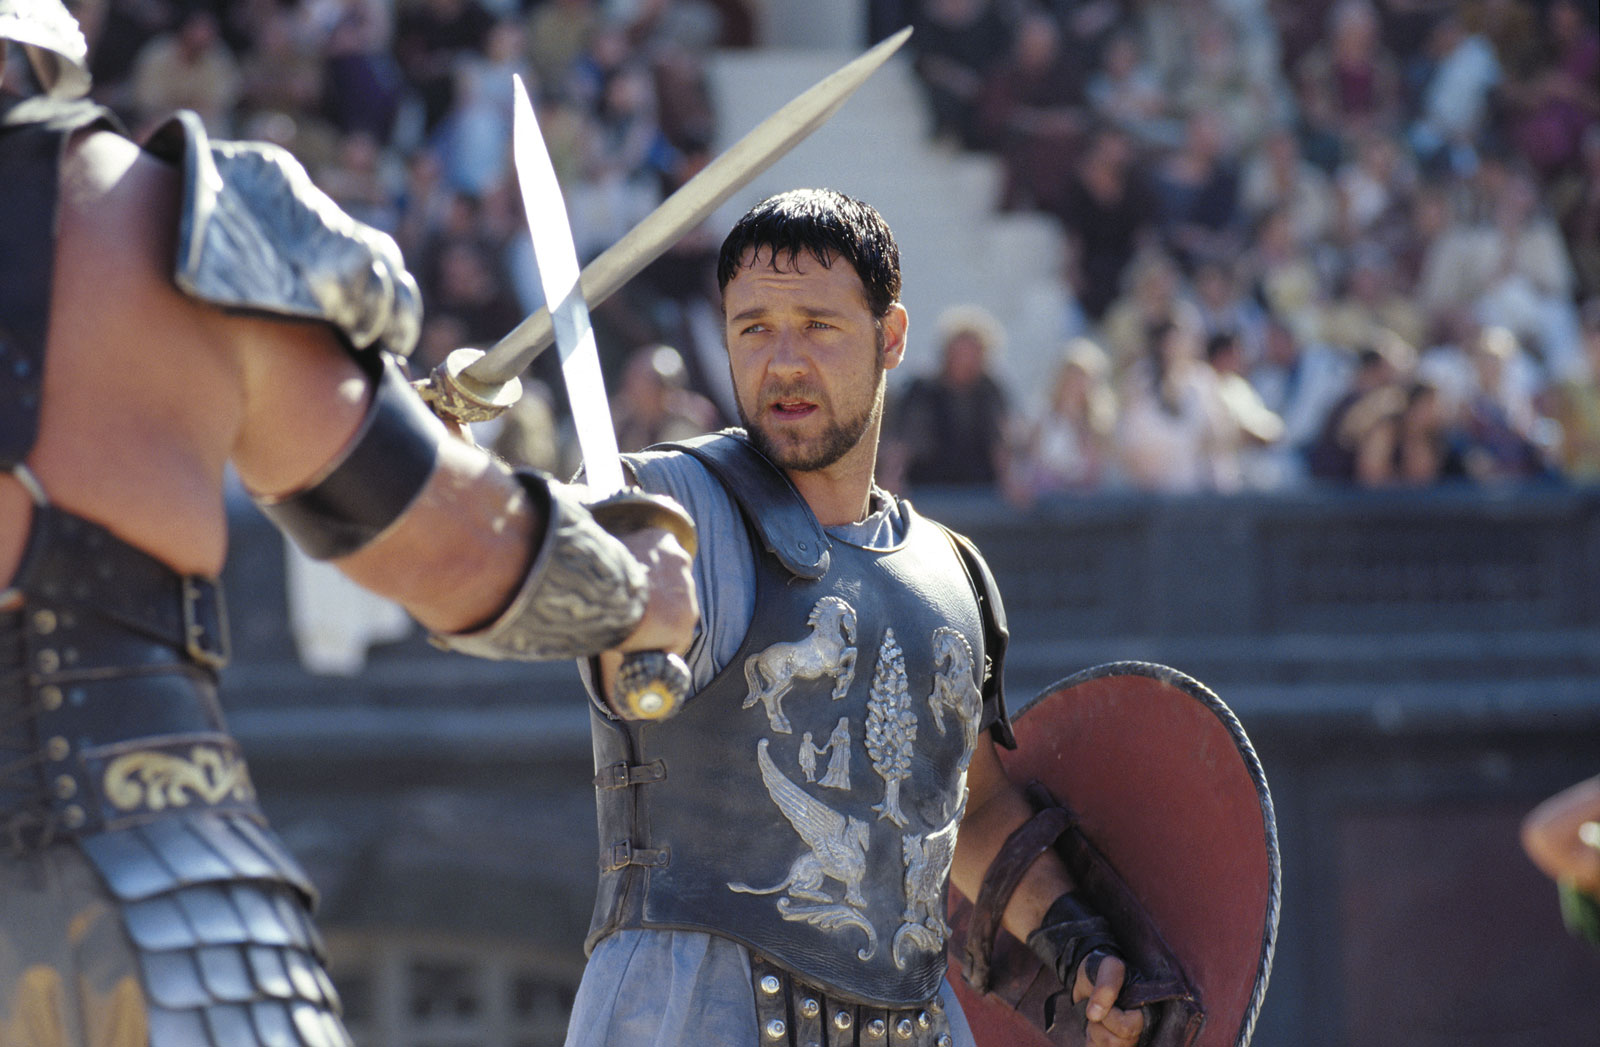 Gladiator Film Review Essay